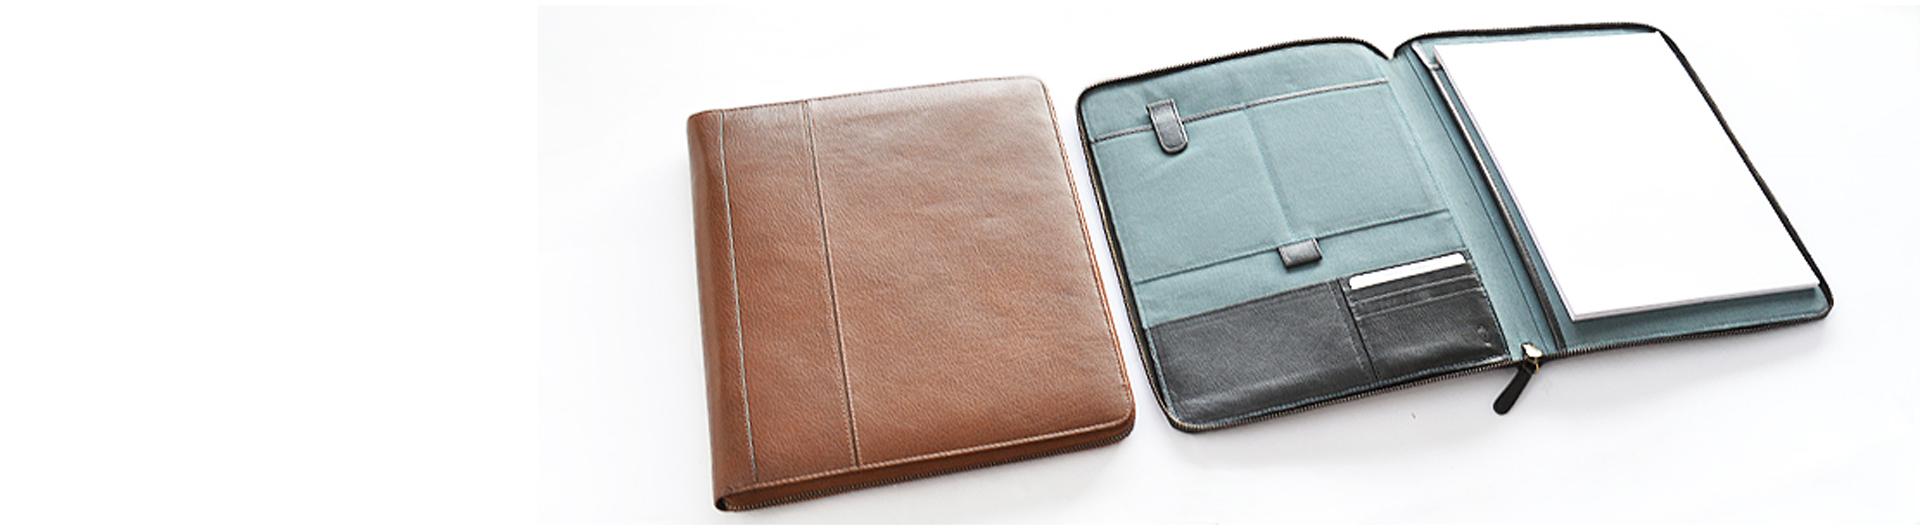 Leather Portfolios